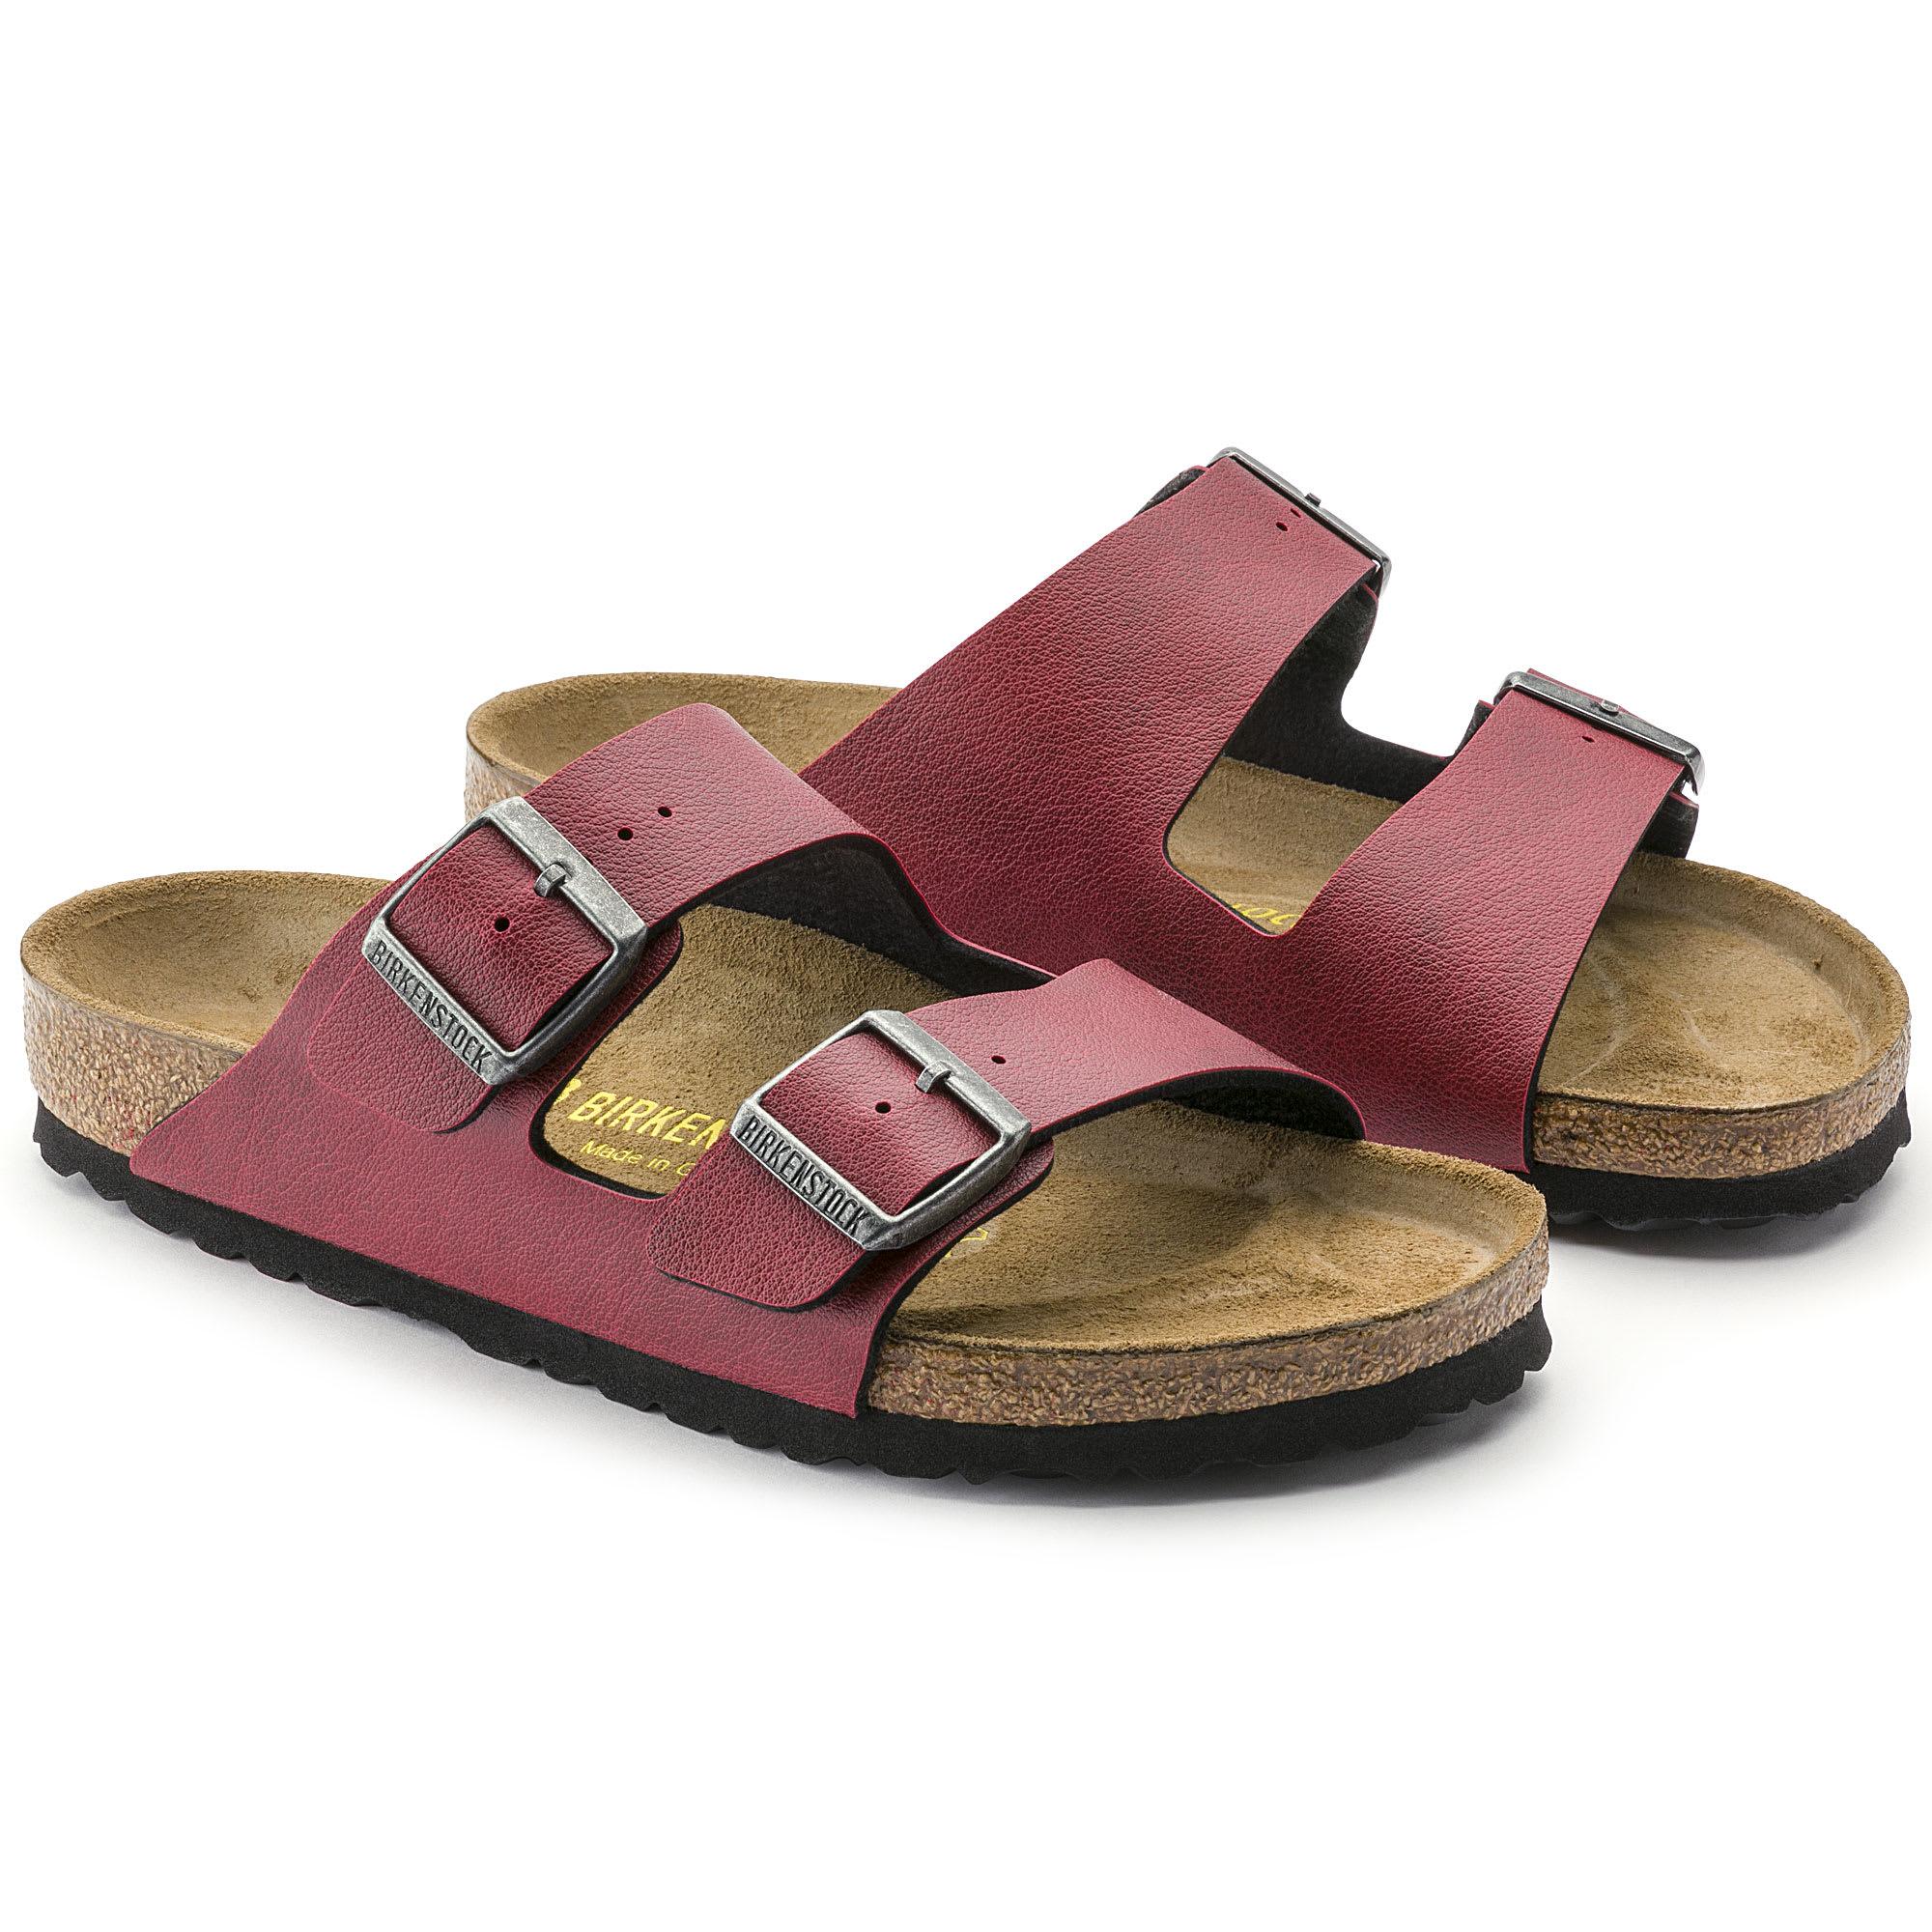 on sale birkenstock arizona sandals womens up to 40 off